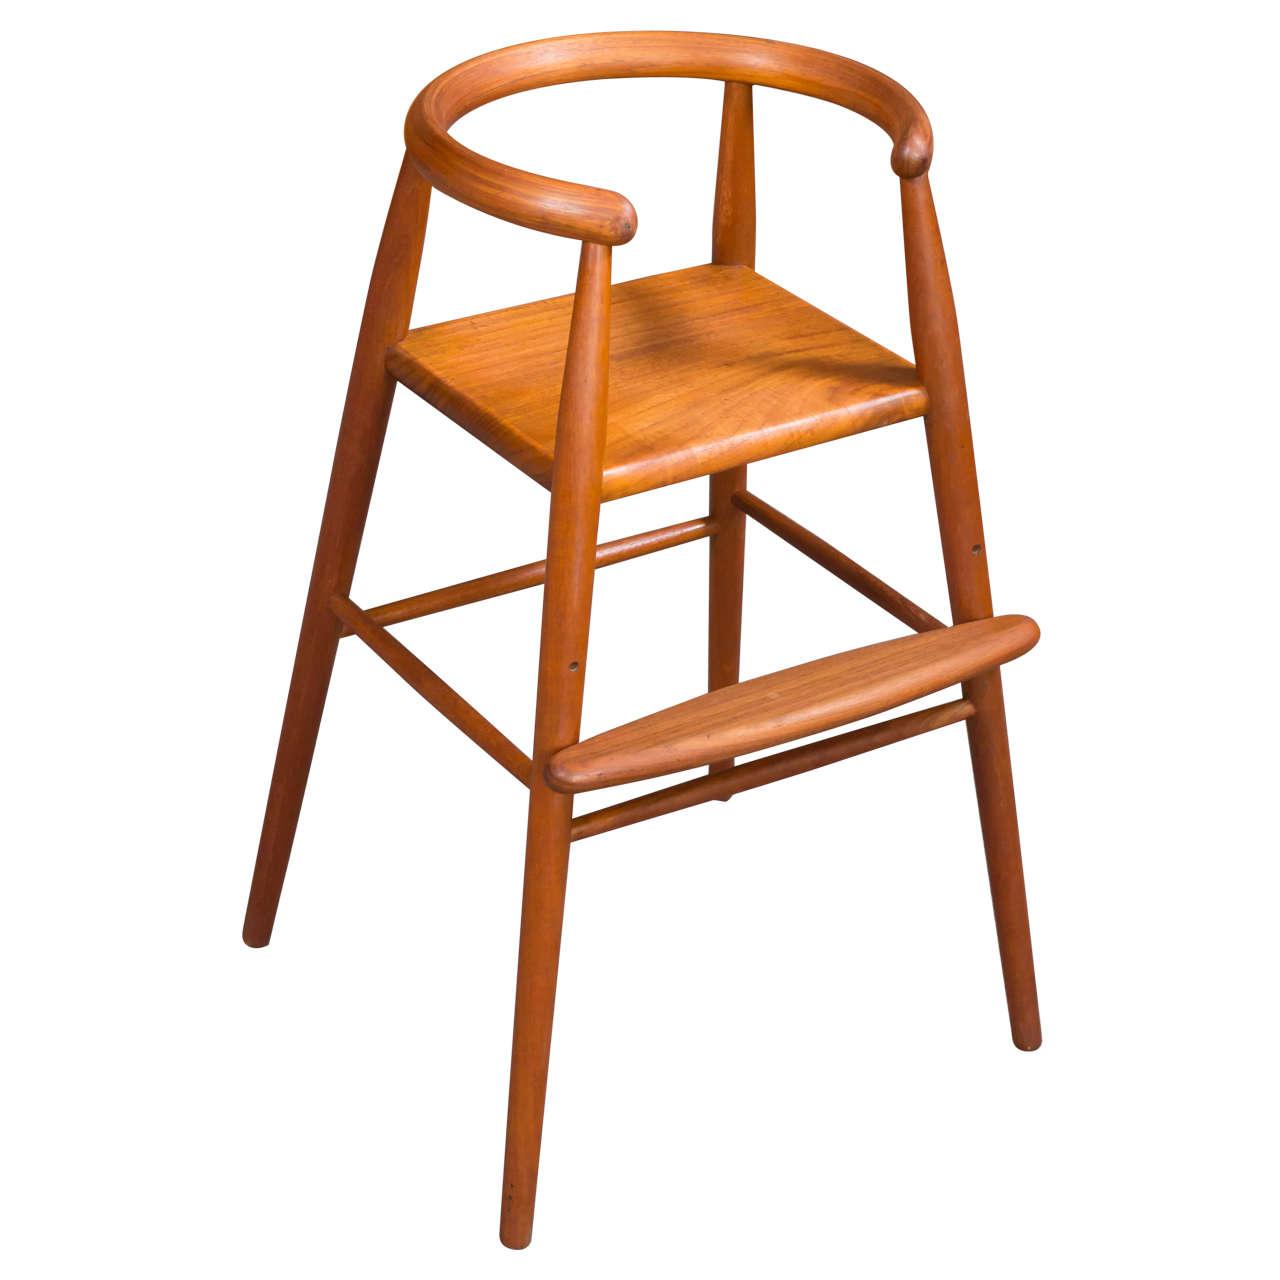 Danish Modern Child's High Chair by Nanna and Jorgen ...